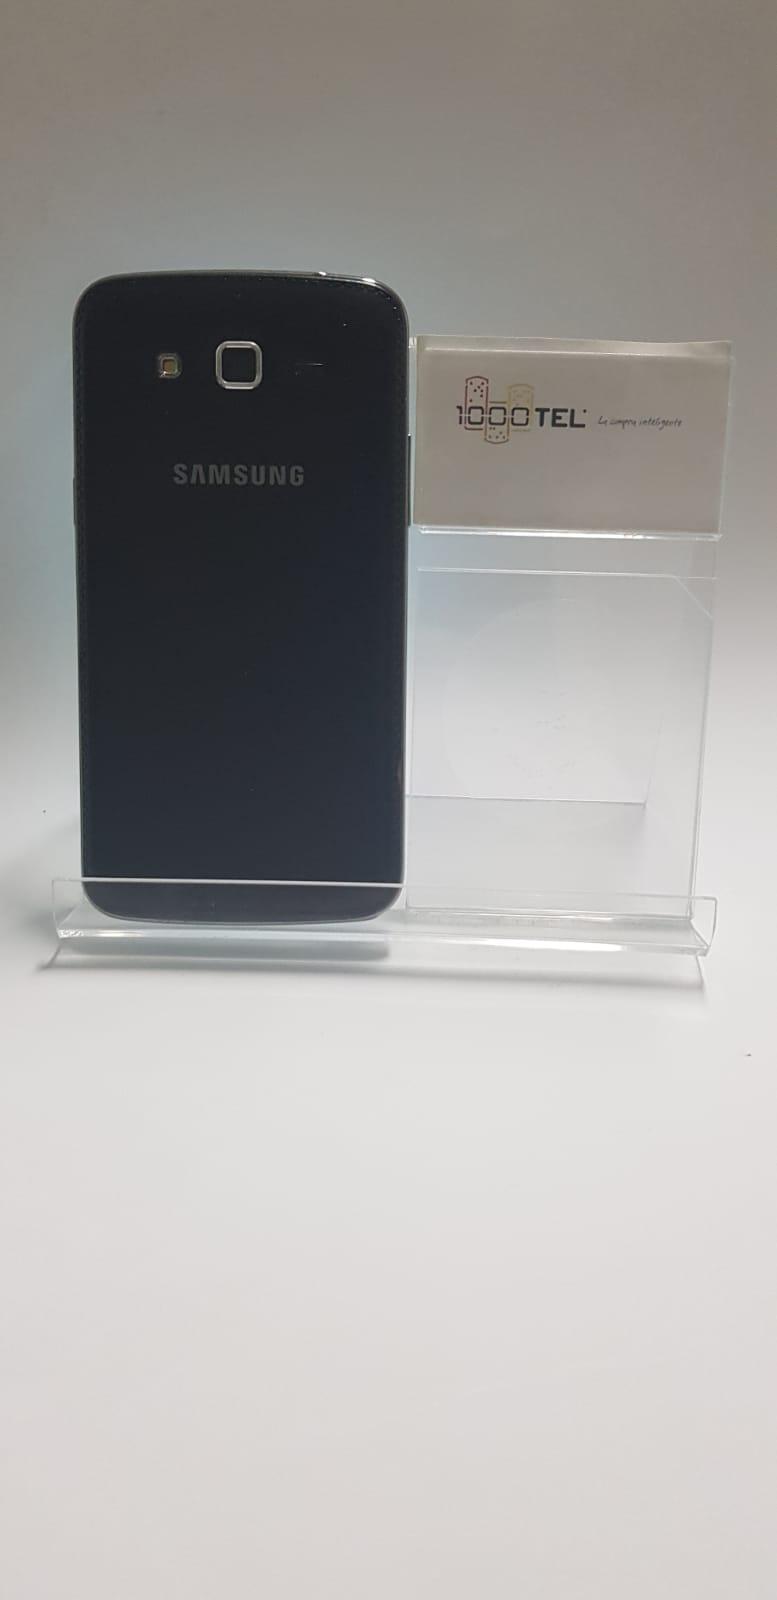 Samsung Galaxy Grand 2 #2